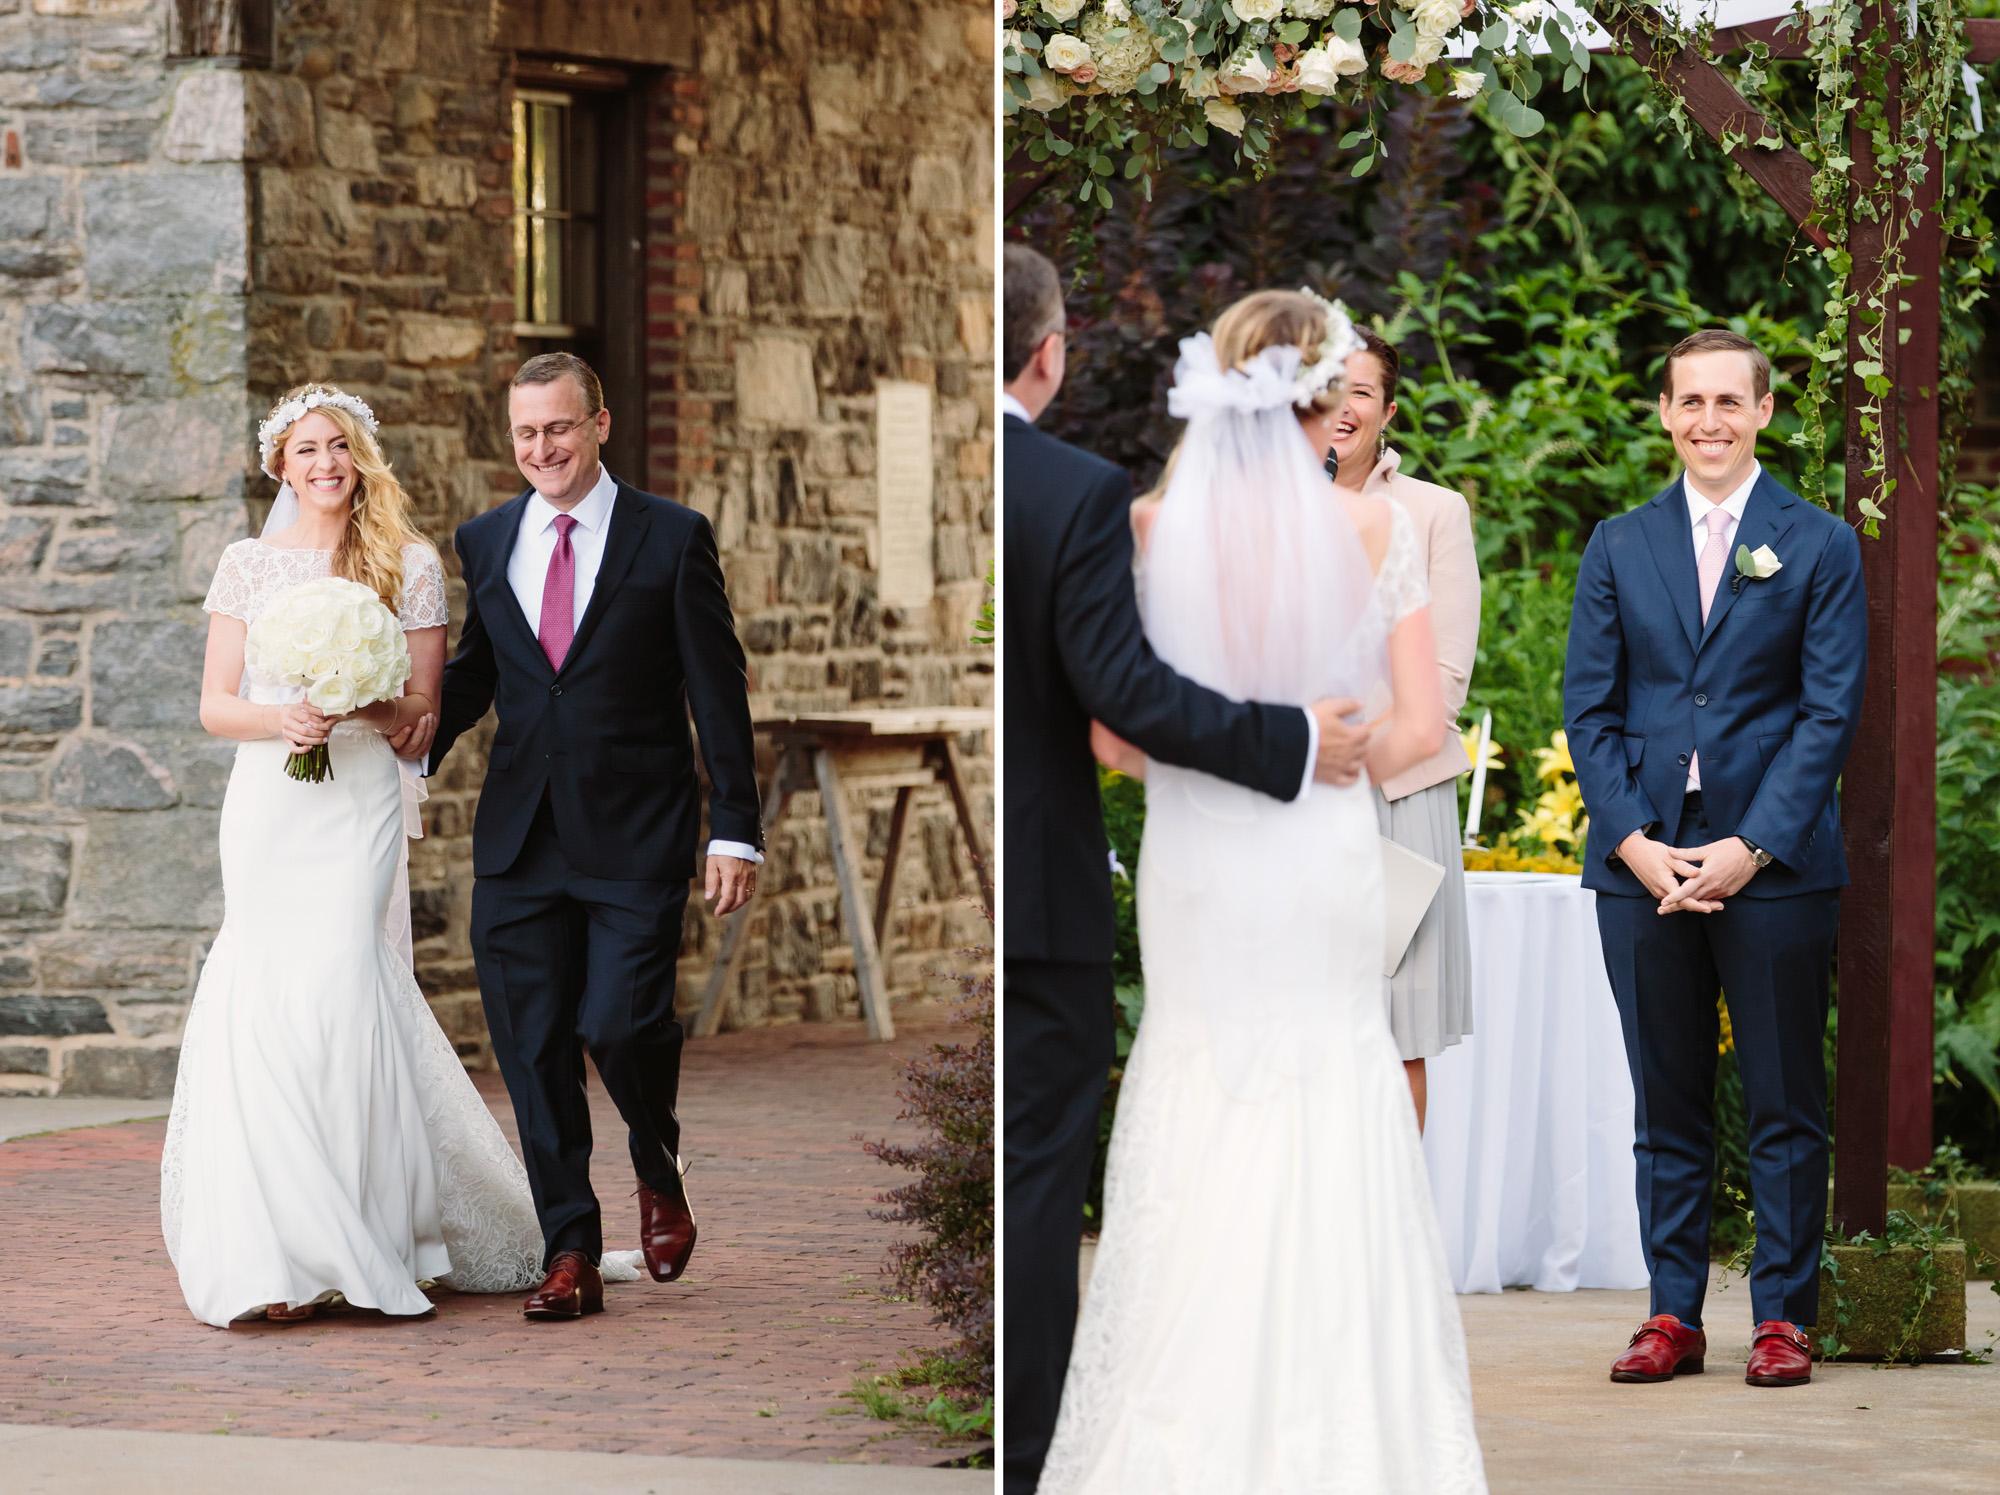 41_Jessica_Ted_Blue_Hill_Stone_Barns_Wedding_Pocantico_NY_Tanya_Salazar_Photography.jpg